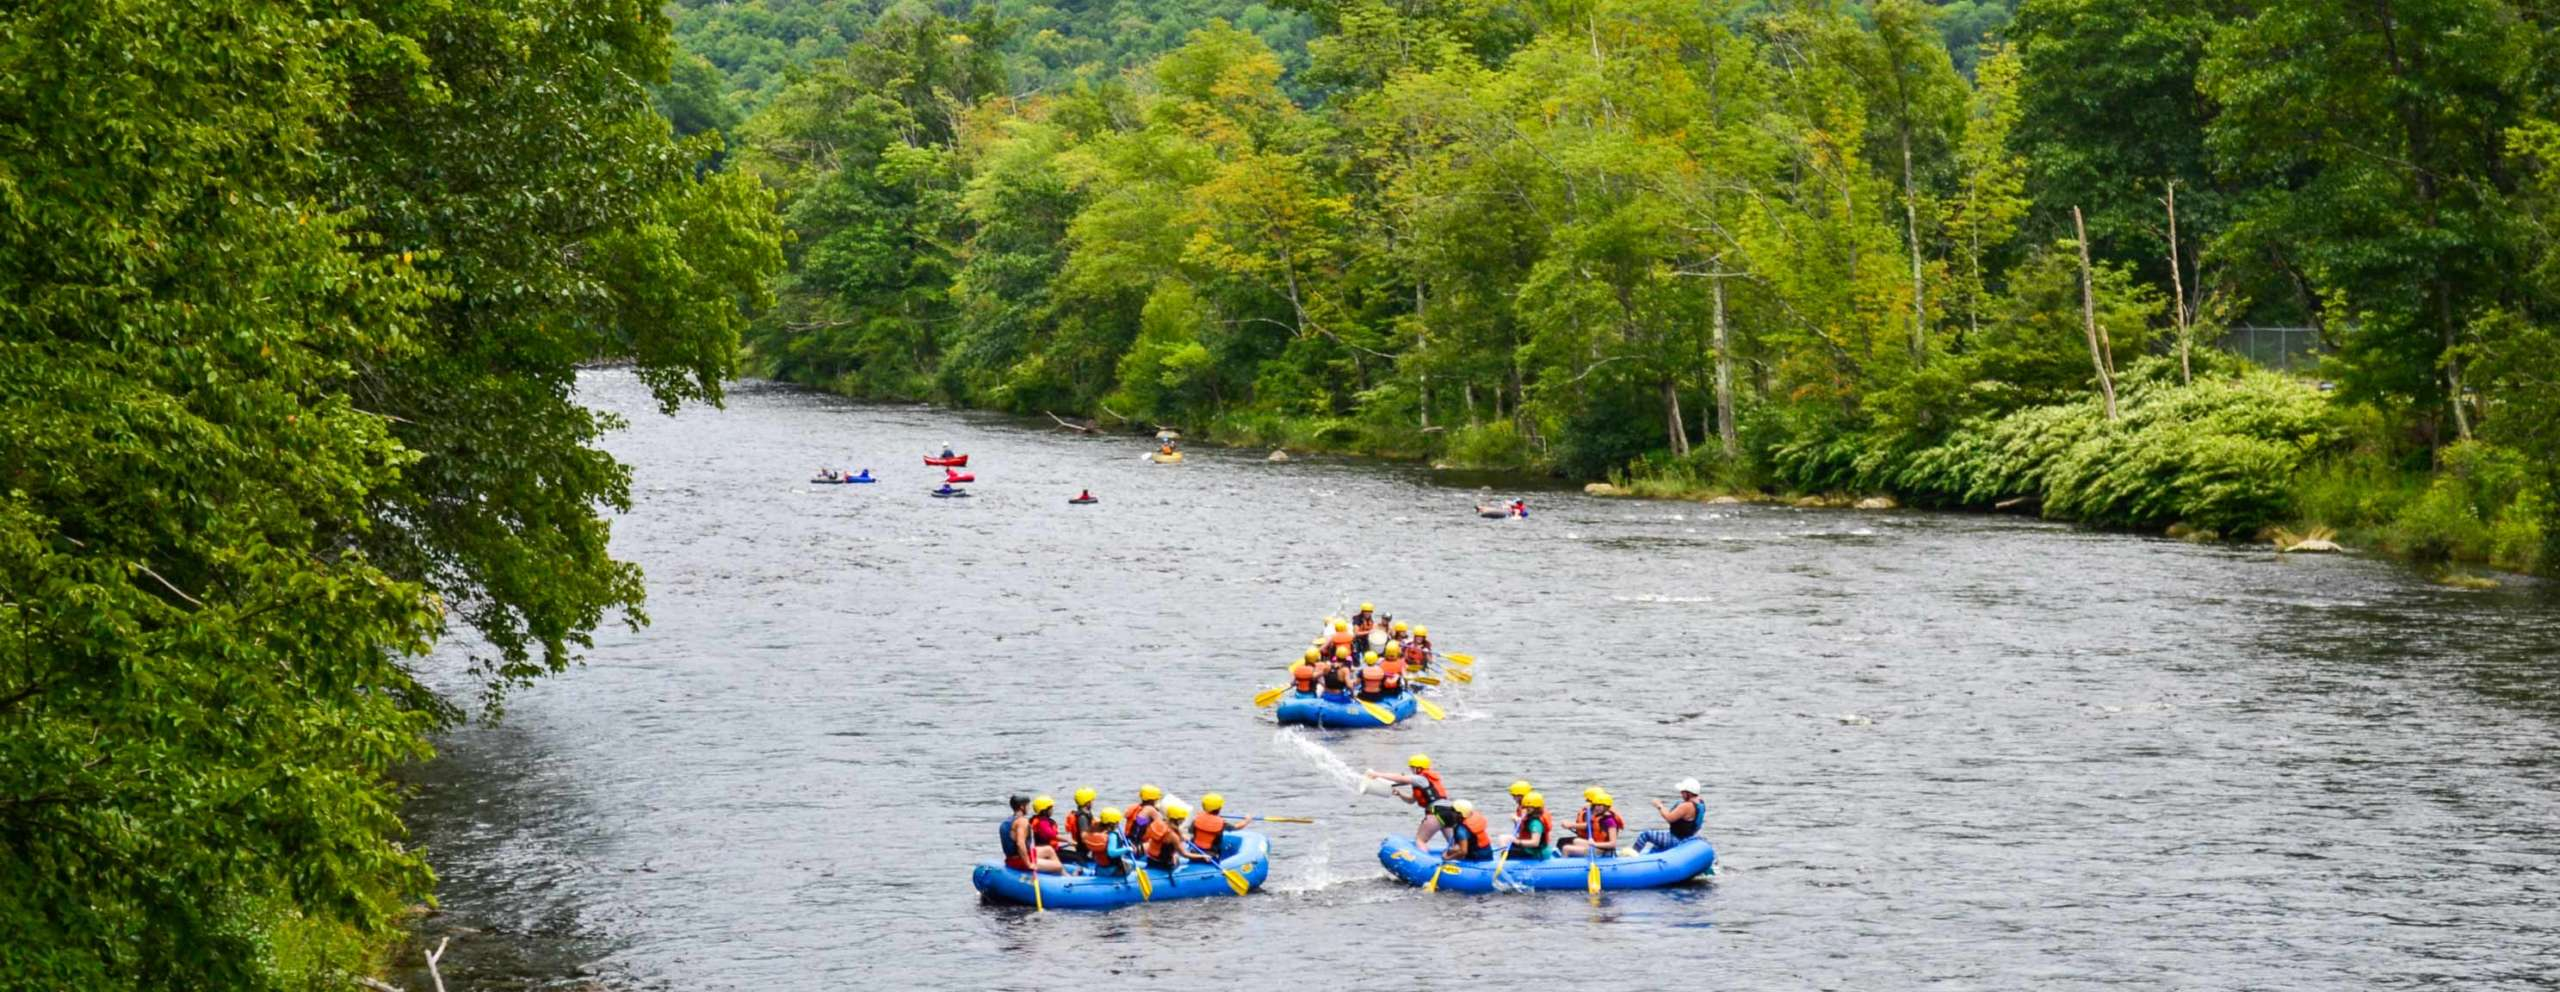 Zoar gap trip rafting down a tree lined river